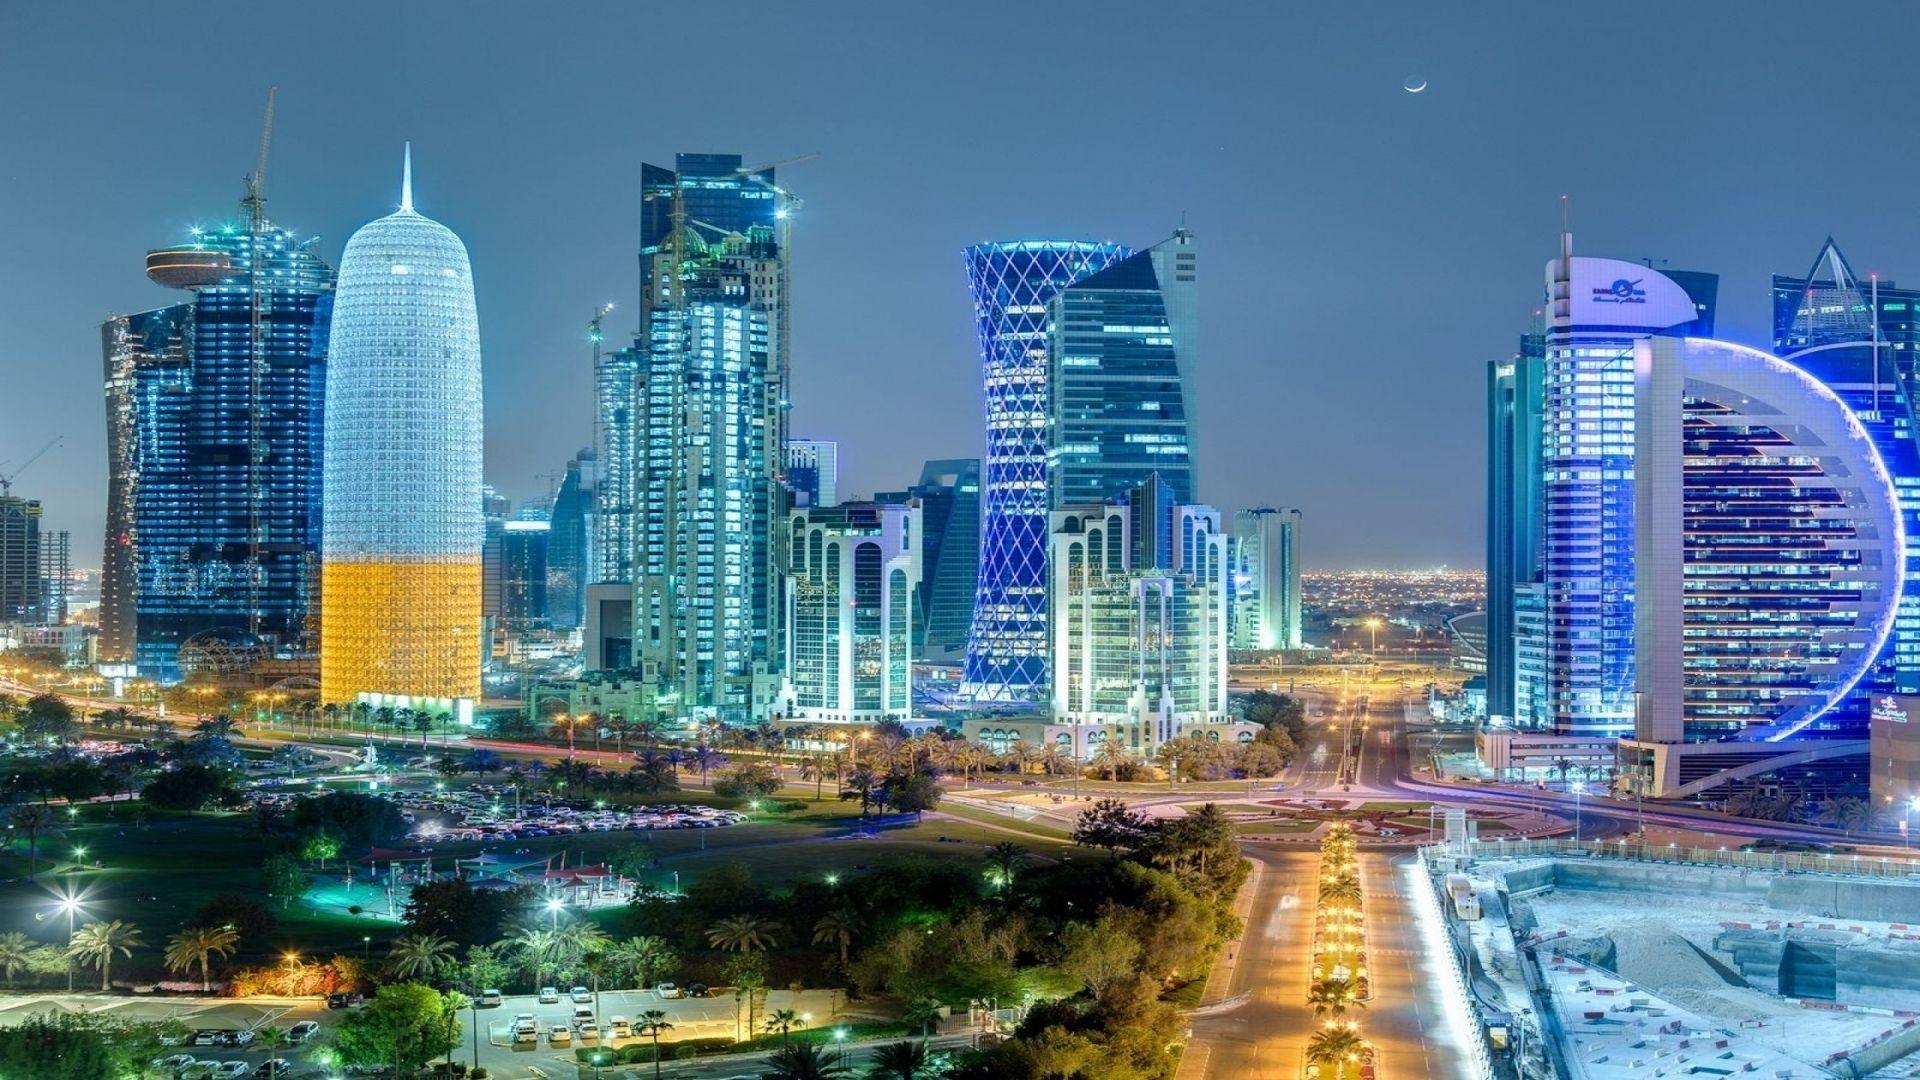 Beautiful Pics Of Dubai Google Search Countries of the